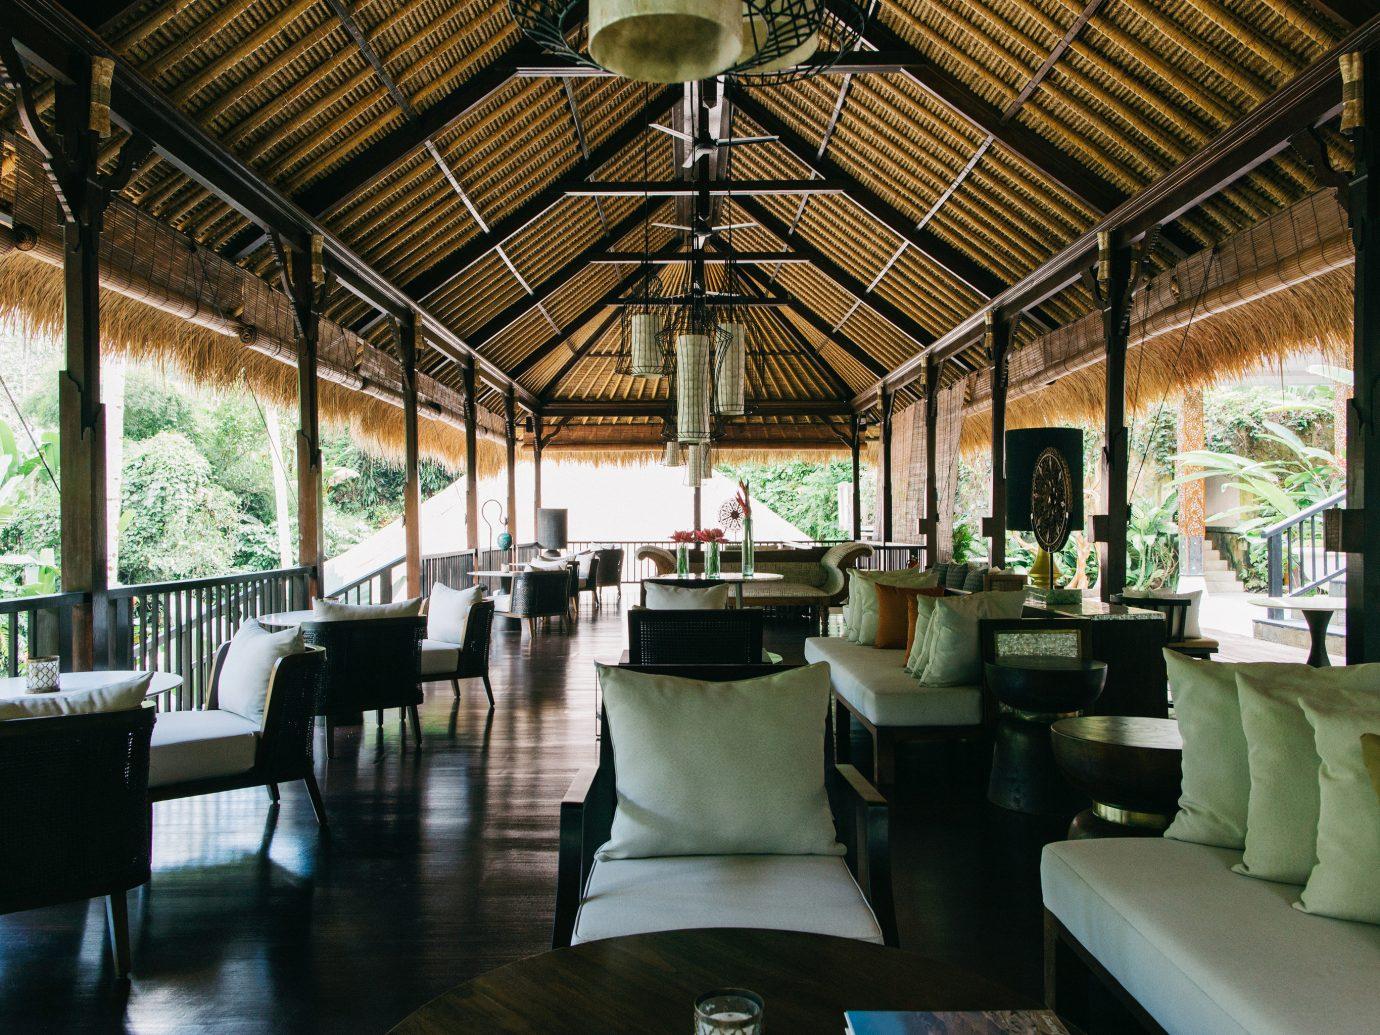 Health + Wellness Hotels indoor floor room restaurant estate Resort meal interior design furniture area several